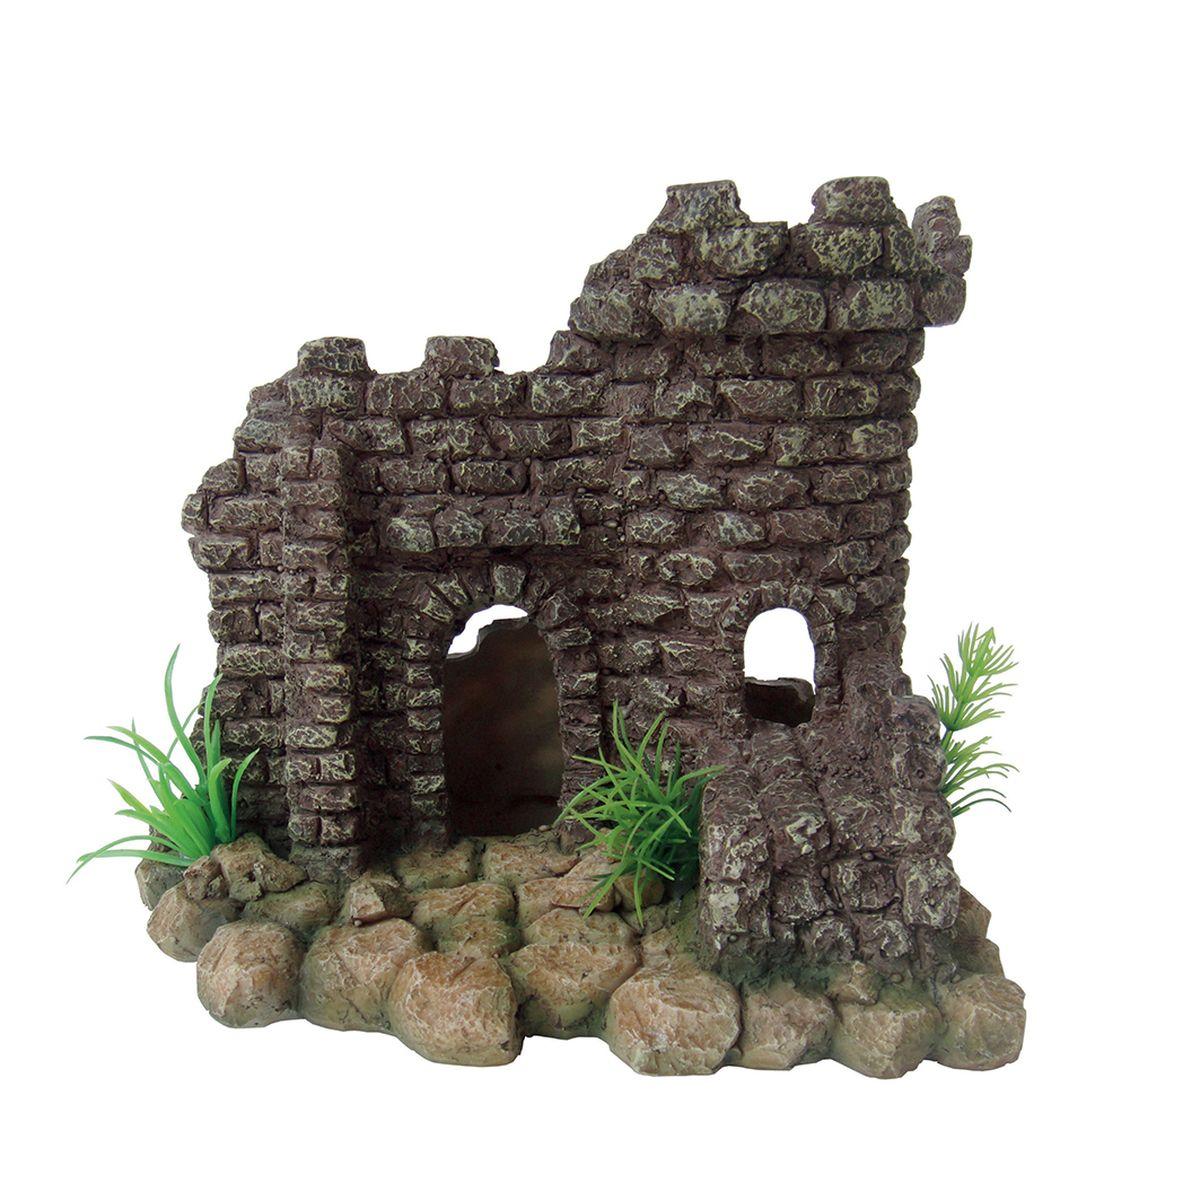 Декорация для аквариума ArtUniq Руины крепости, 20 x 17 x 17,5 см декорация для аквариума artuniq пористый камень 20 5 x 10 5 x 18 8 см